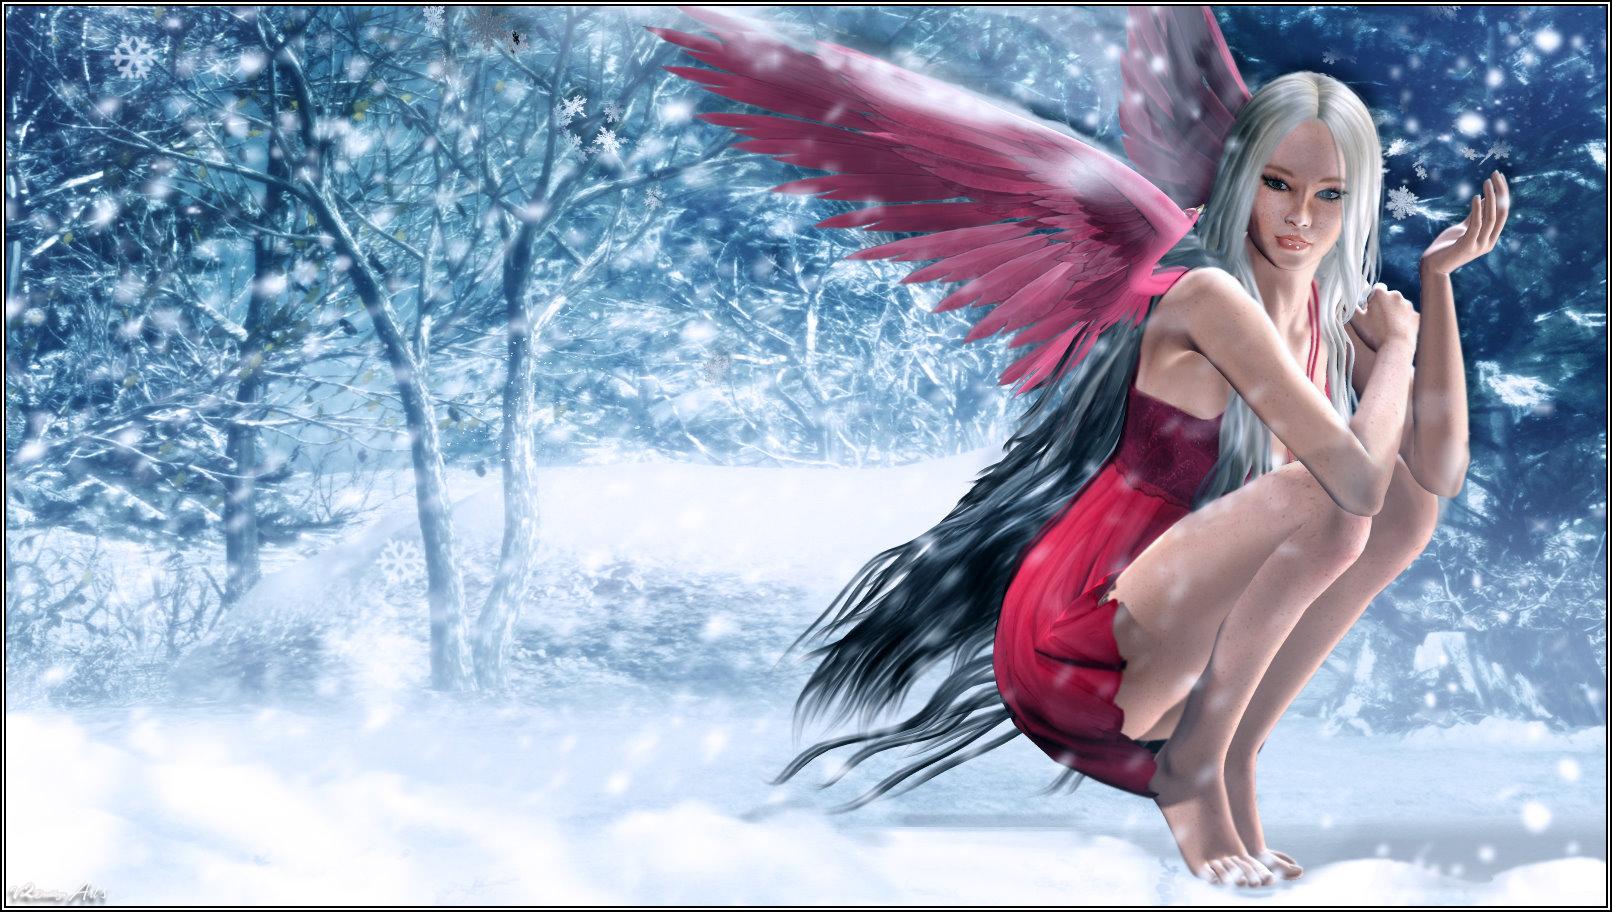 download Fantasy Wallpaper Fairy Wallpaper [1612x912] for 1612x912